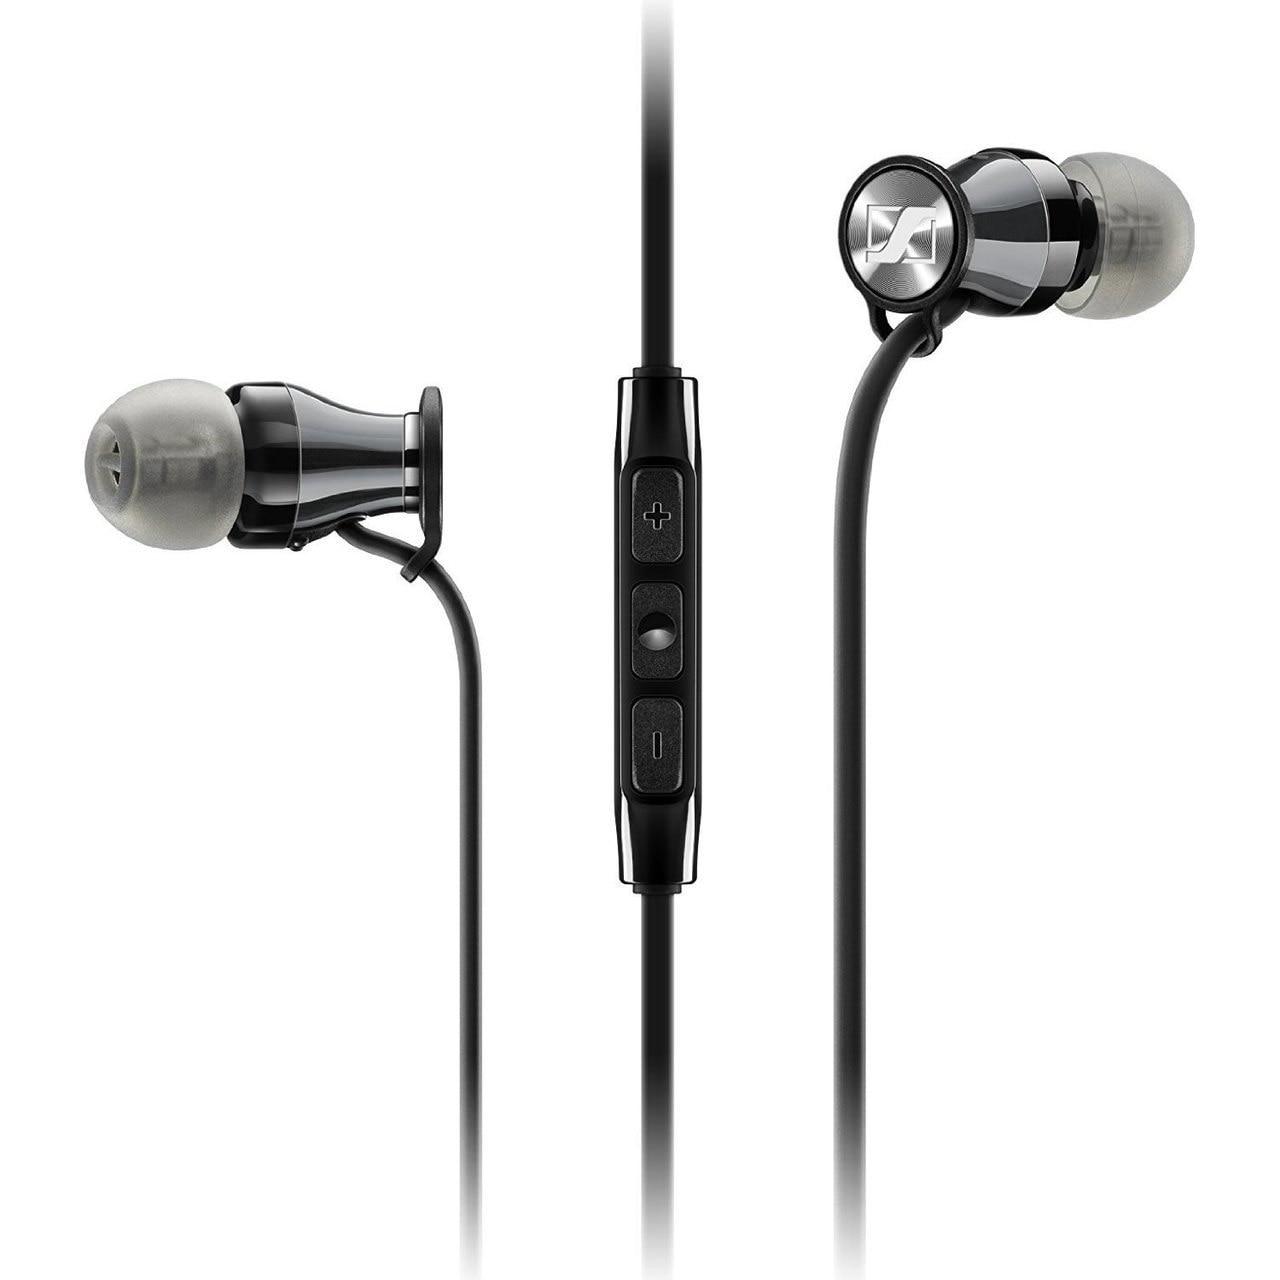 Sennheiser In-Ear Earphones for Galaxy - Momentum M2 IEI for iOS - Black